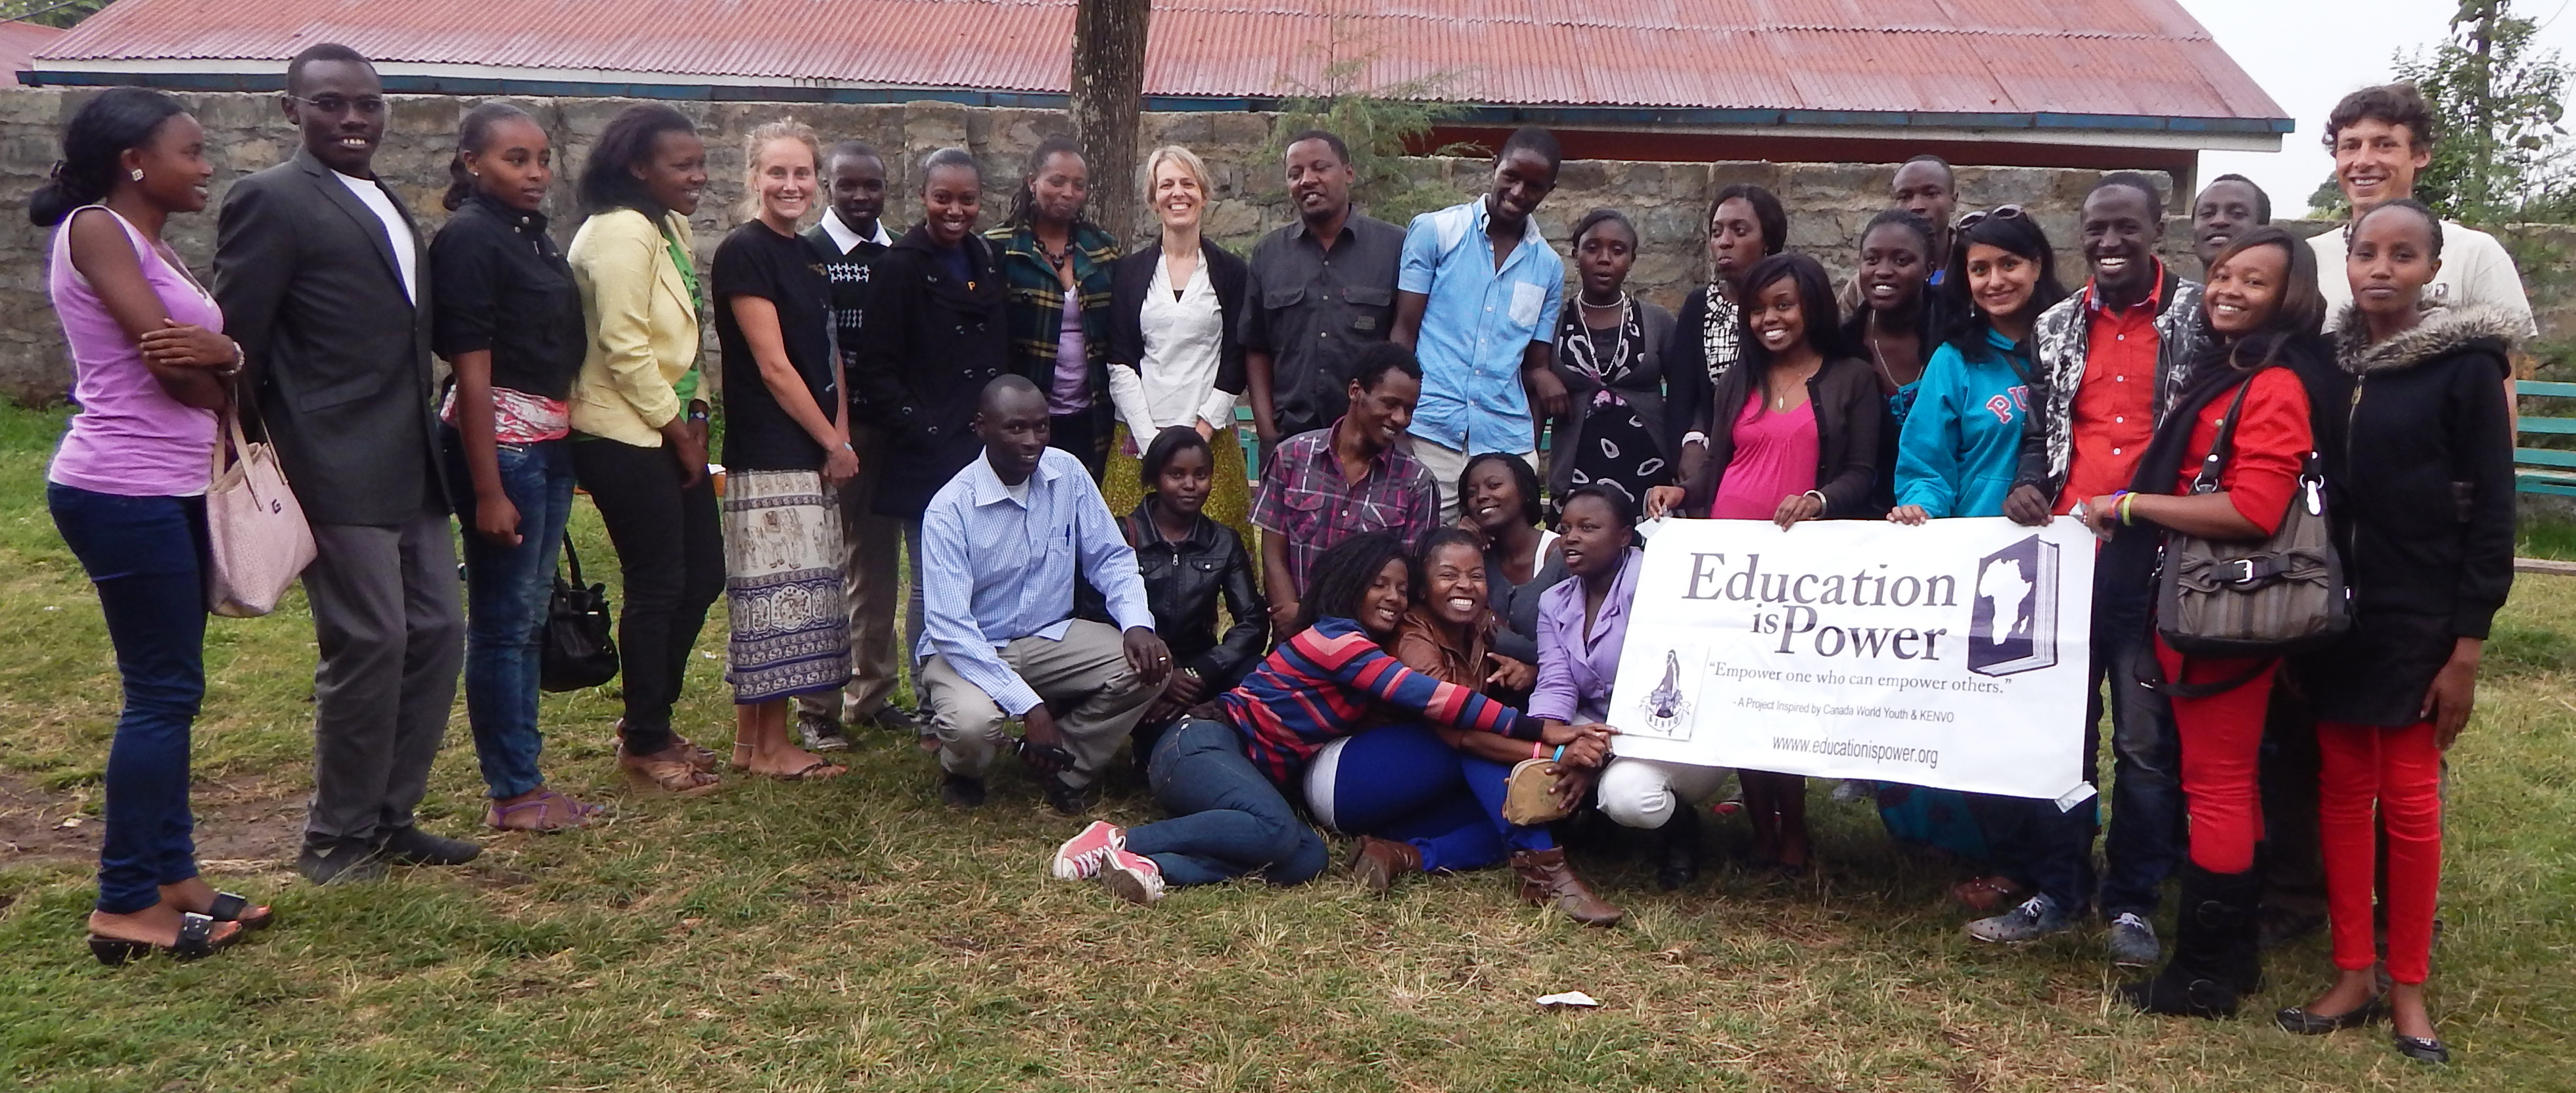 EIP Fundraiser, Kijabe Kenya - Feb 9, 2014